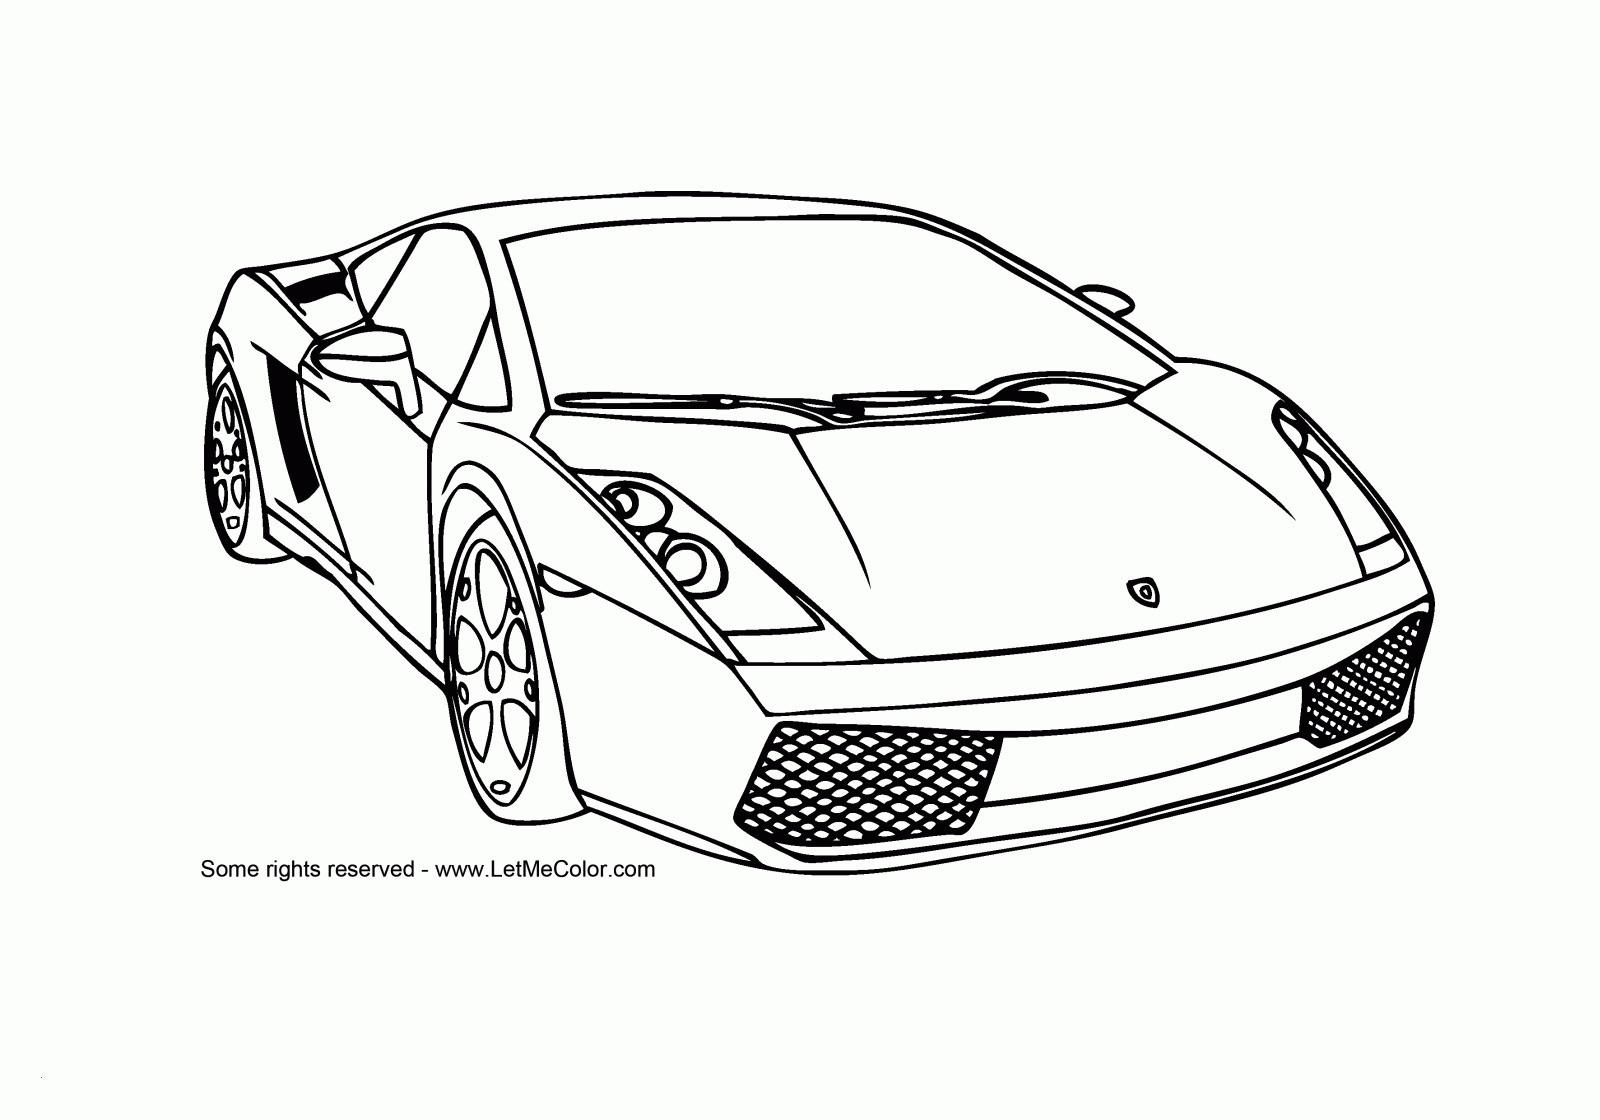 Ausmalbilder Autos Lamborghini Das Beste Von Sports Cars Coloring Pages Free Schön Ausmalbilder Autos Lamborghini Sammlung